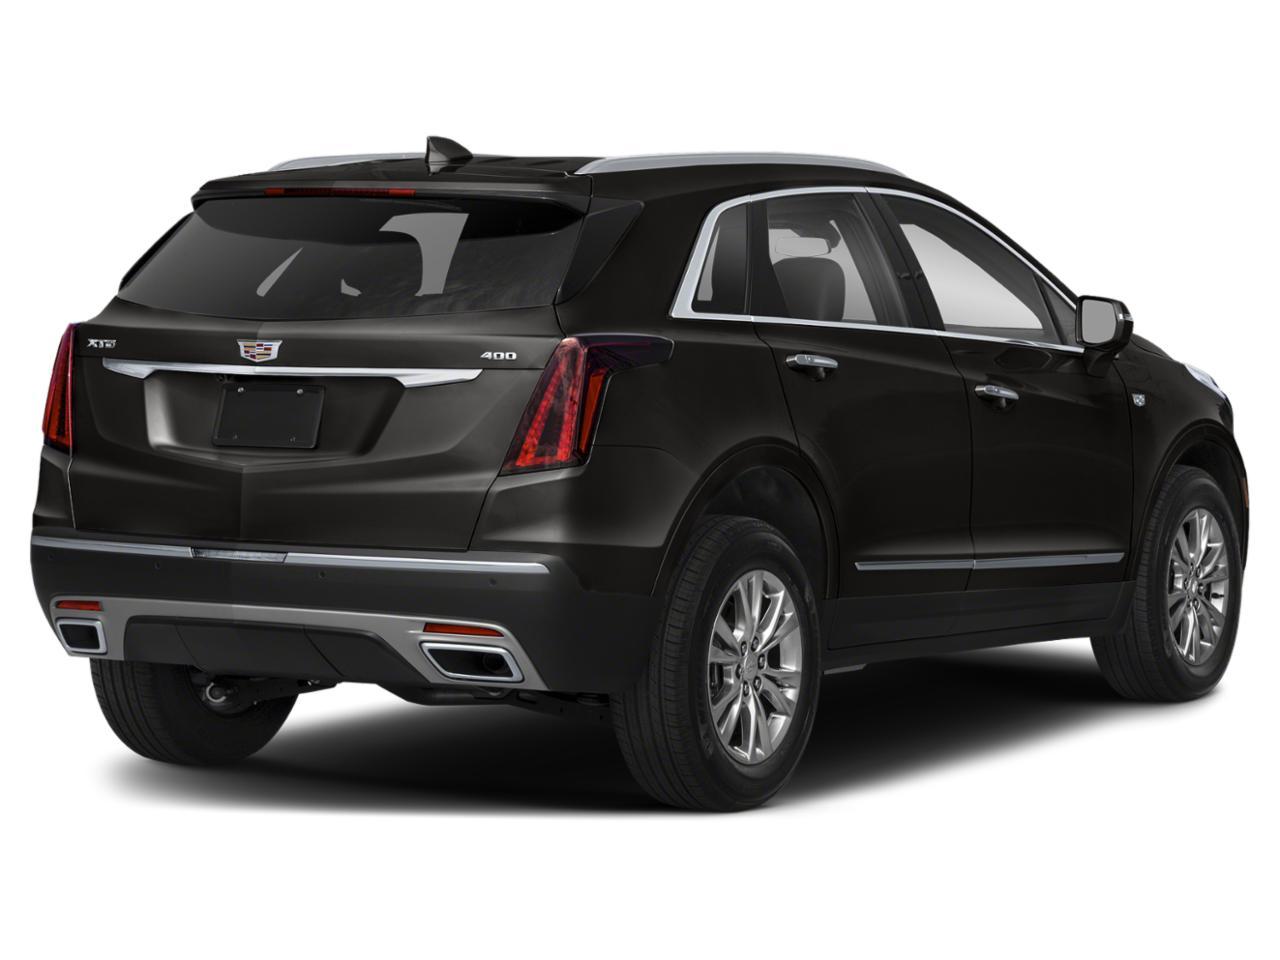 New 2021 Cadillac XT5 Shadow Metallic FWD Premium Luxury ...